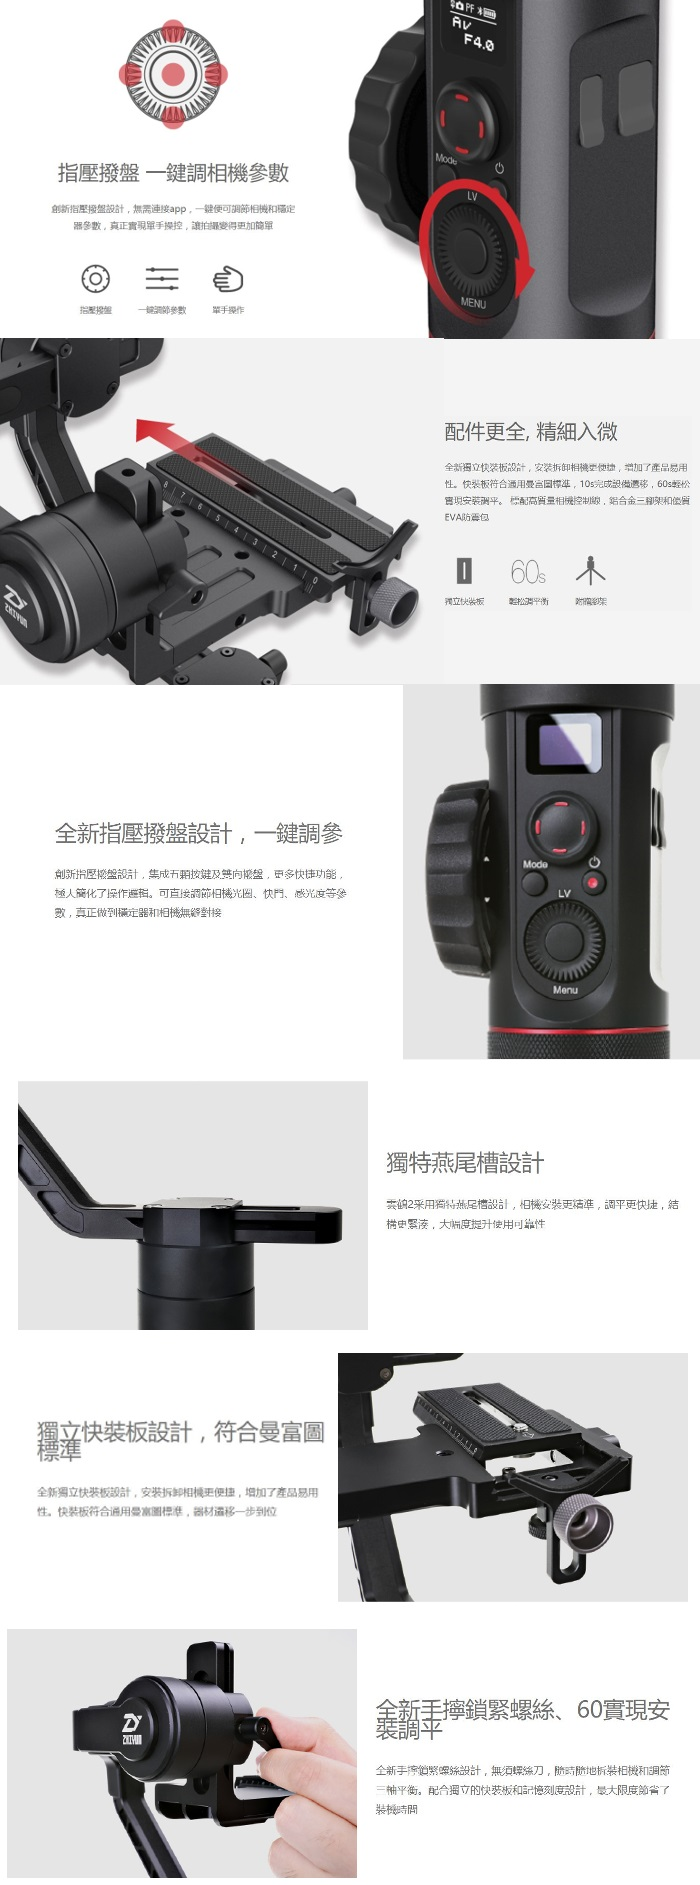 zhiyun-crane-2-dslr-gimble-d-yingkee2.jpg